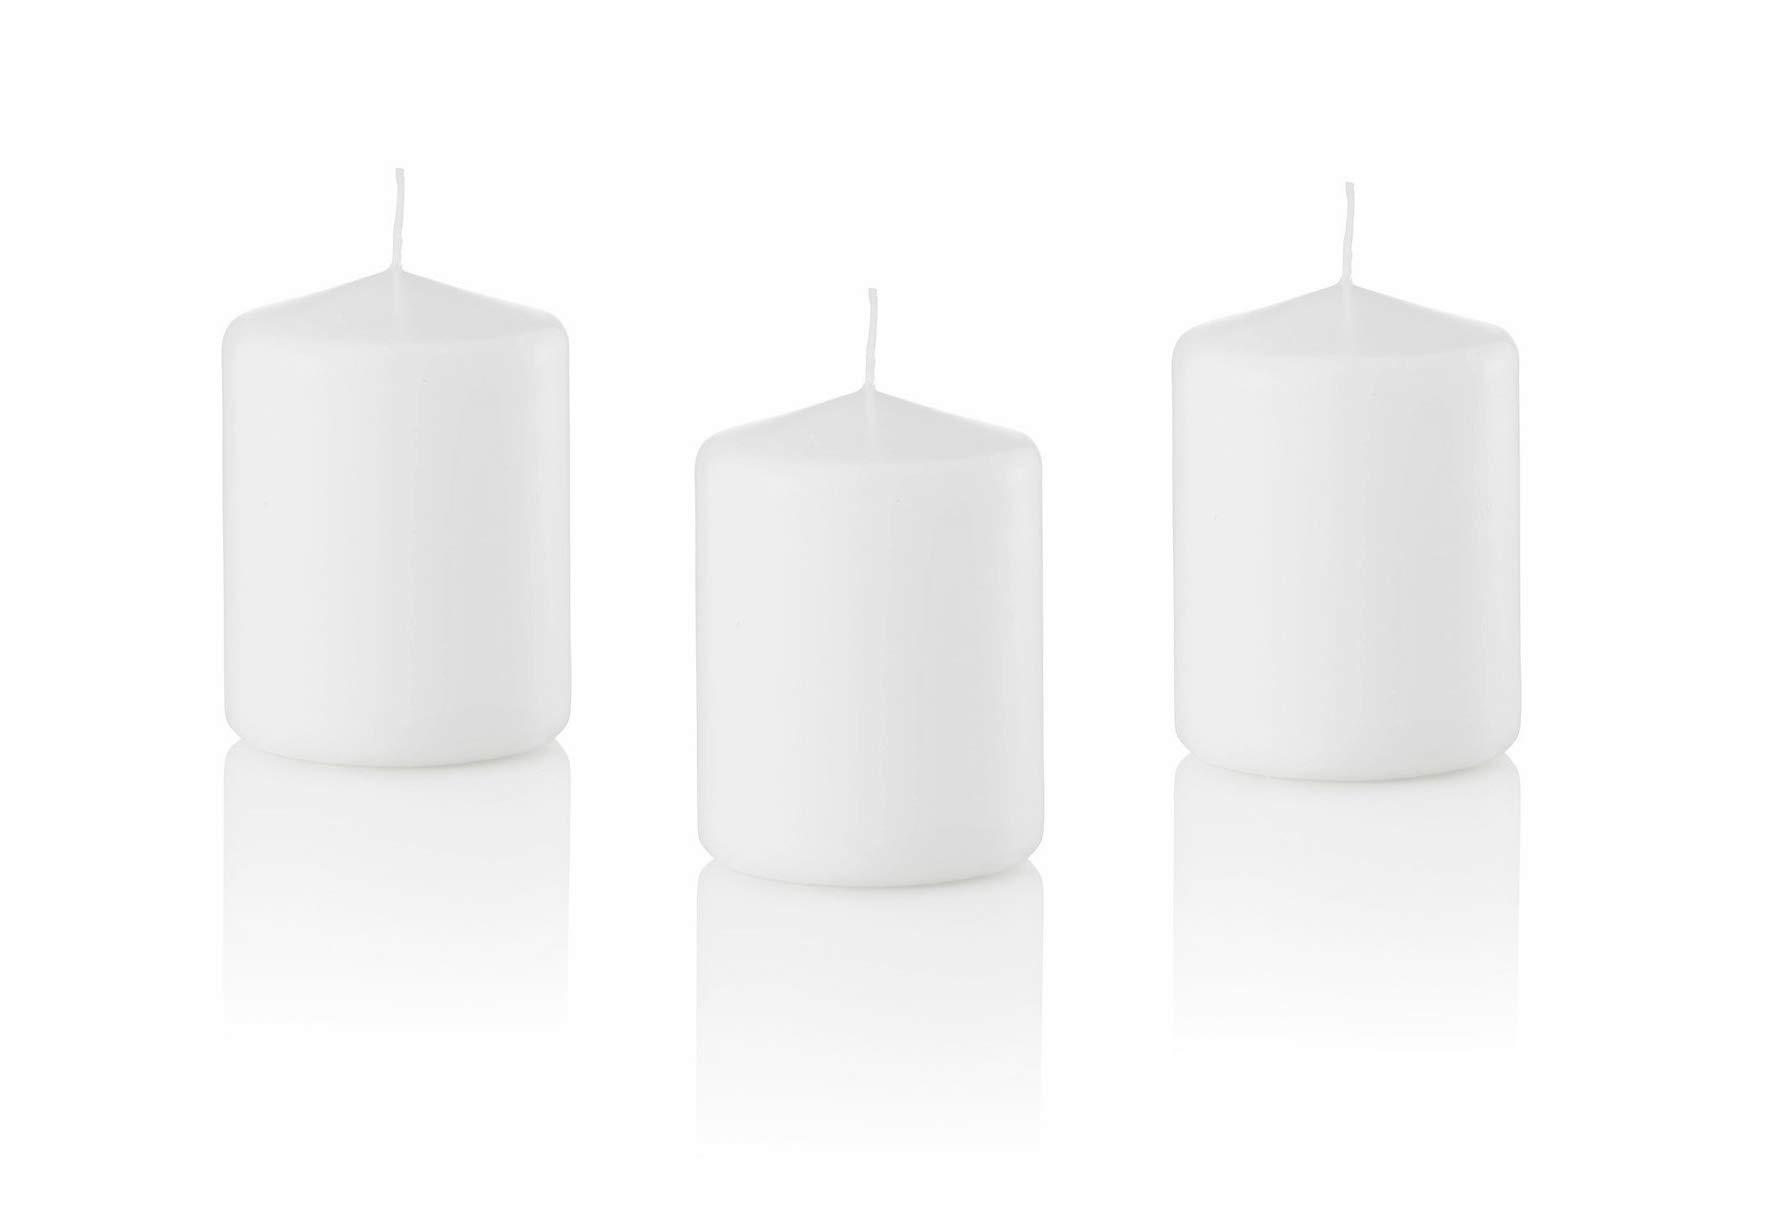 D'light Online 3 X 4 Pillar Candles Bulk Event Pack Round Unscented White Pillar Candles Qty 12 - (White)